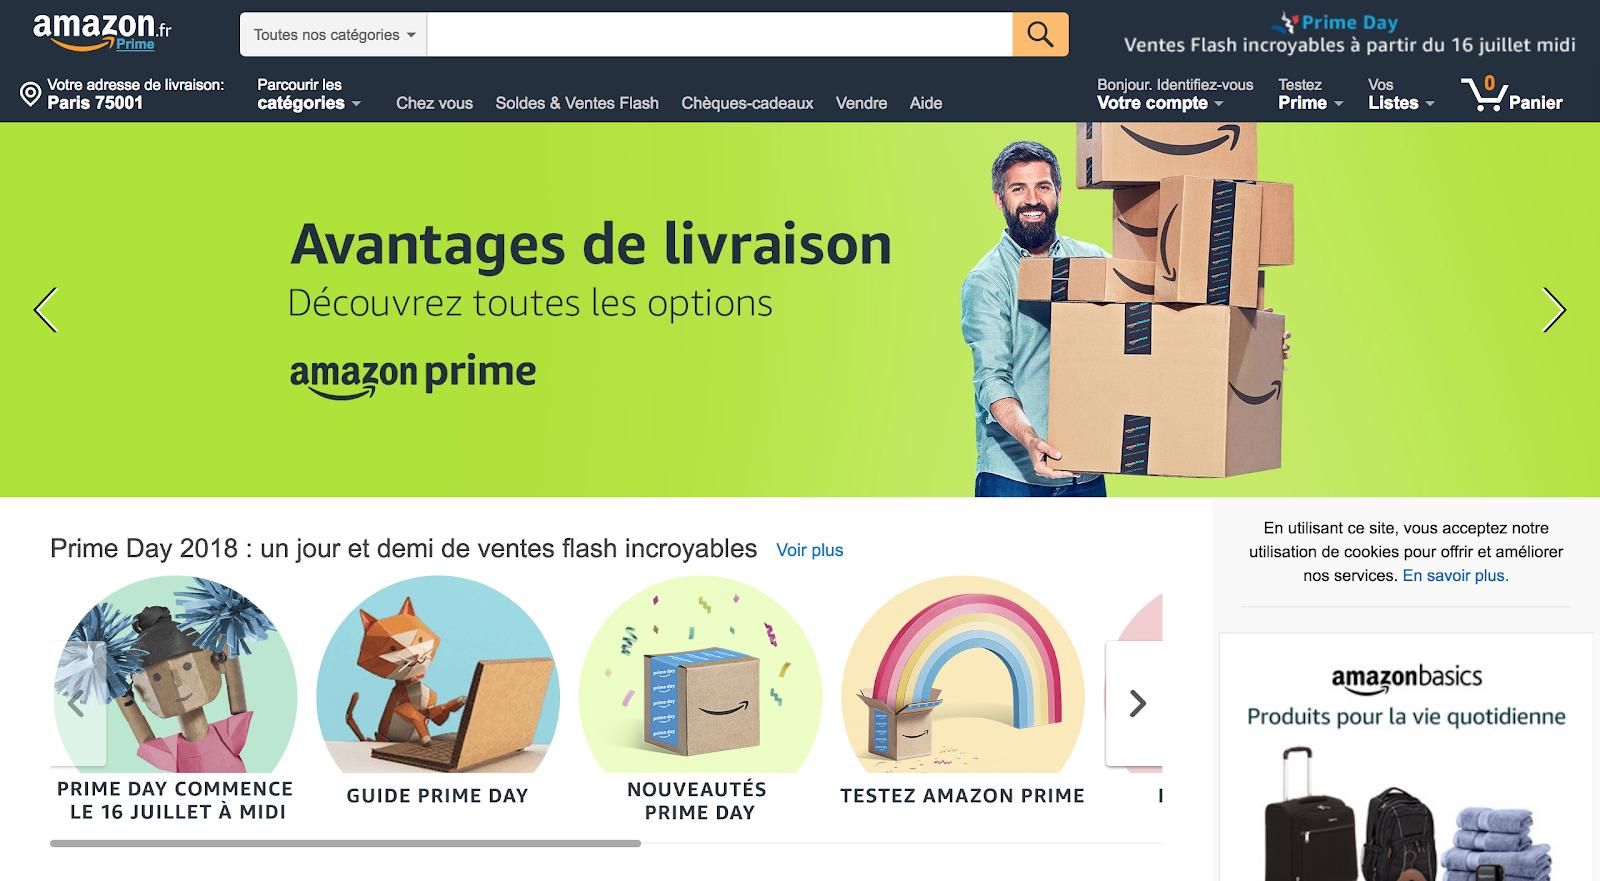 Landing page d'Amazon en juillet 2018